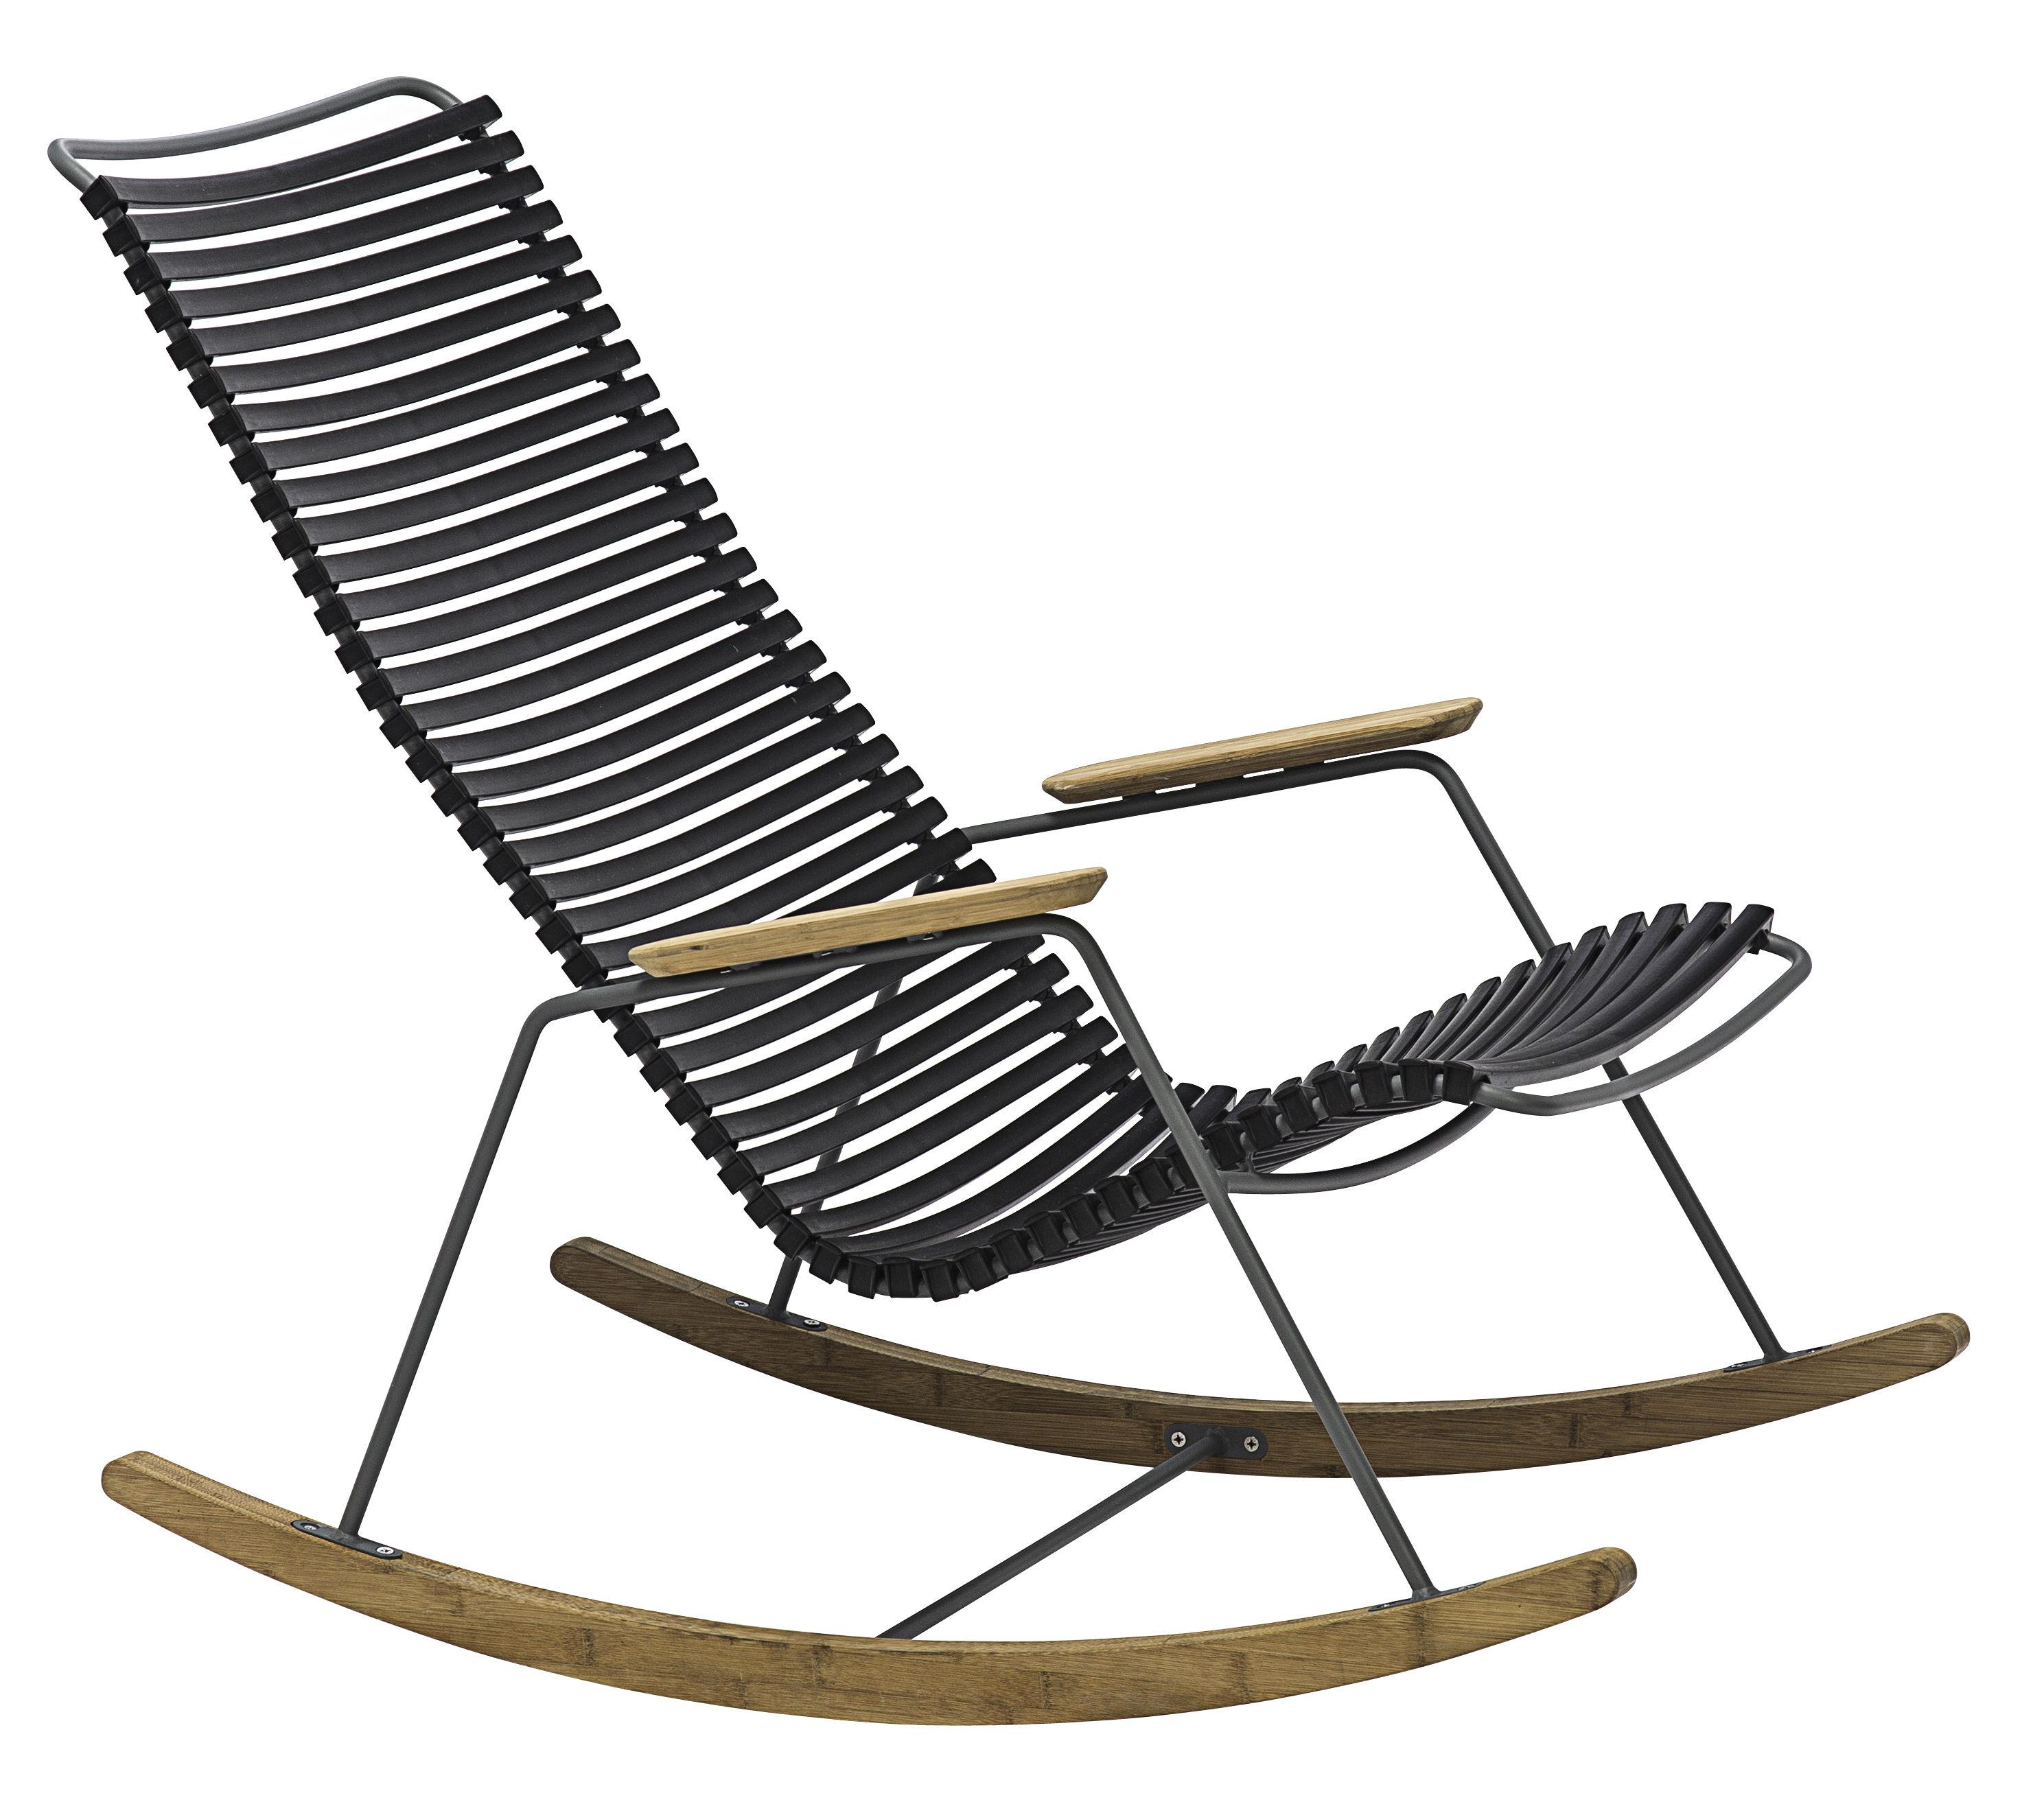 Möbel - Lounge Sessel - Click Schaukelstuhl / Kunststoff & Bambus - Houe - Schwarz - Bambus, Metall, Plastikmaterial